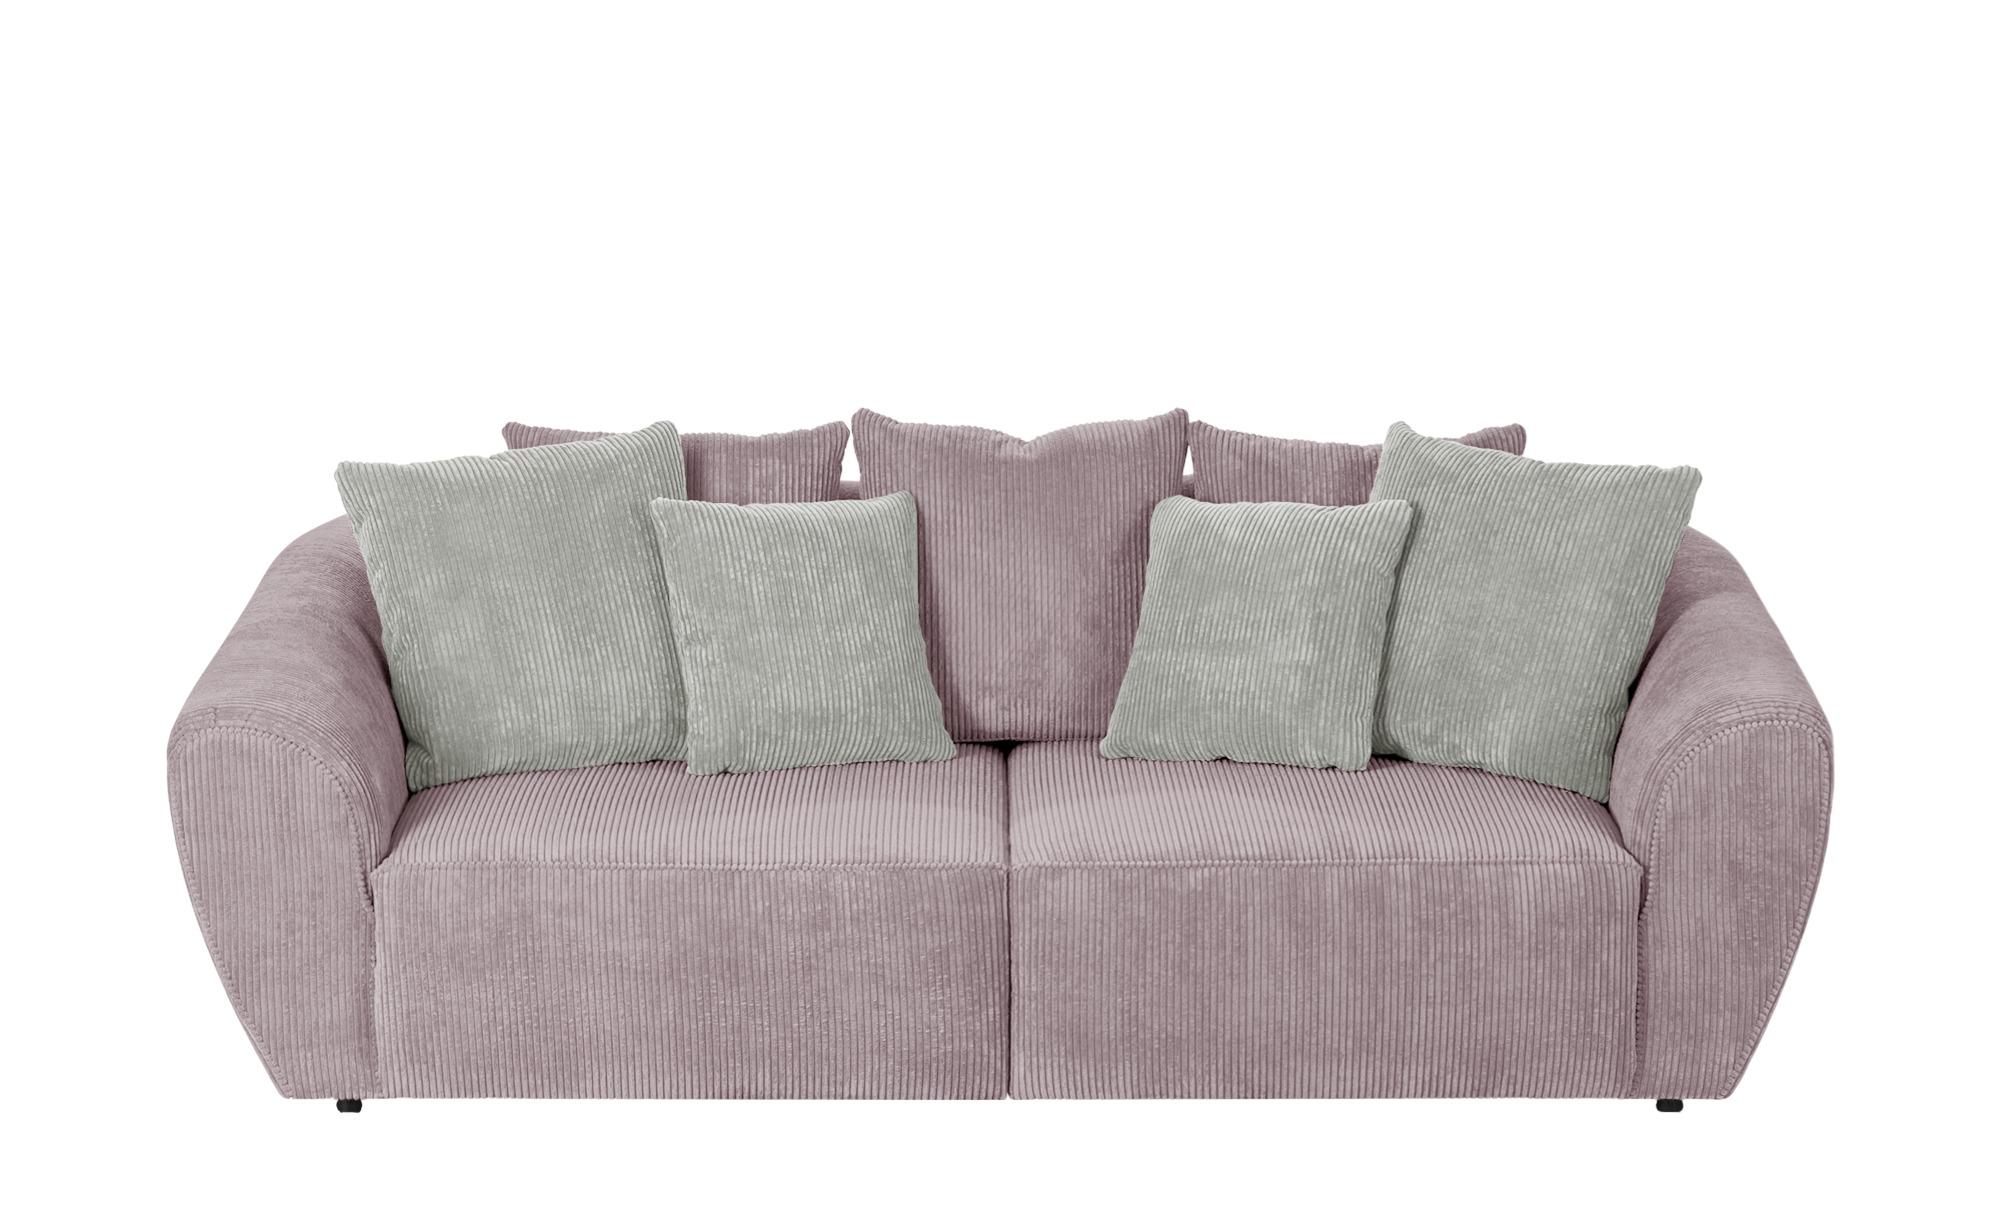 smart Big Sofa altrosa - Cordstoff Savita ¦ rosa/pink ¦ Maße (cm): B: 254 H: 80 T: 113 Polstermöbel > Sofas > 3-Sitzer - Höffner